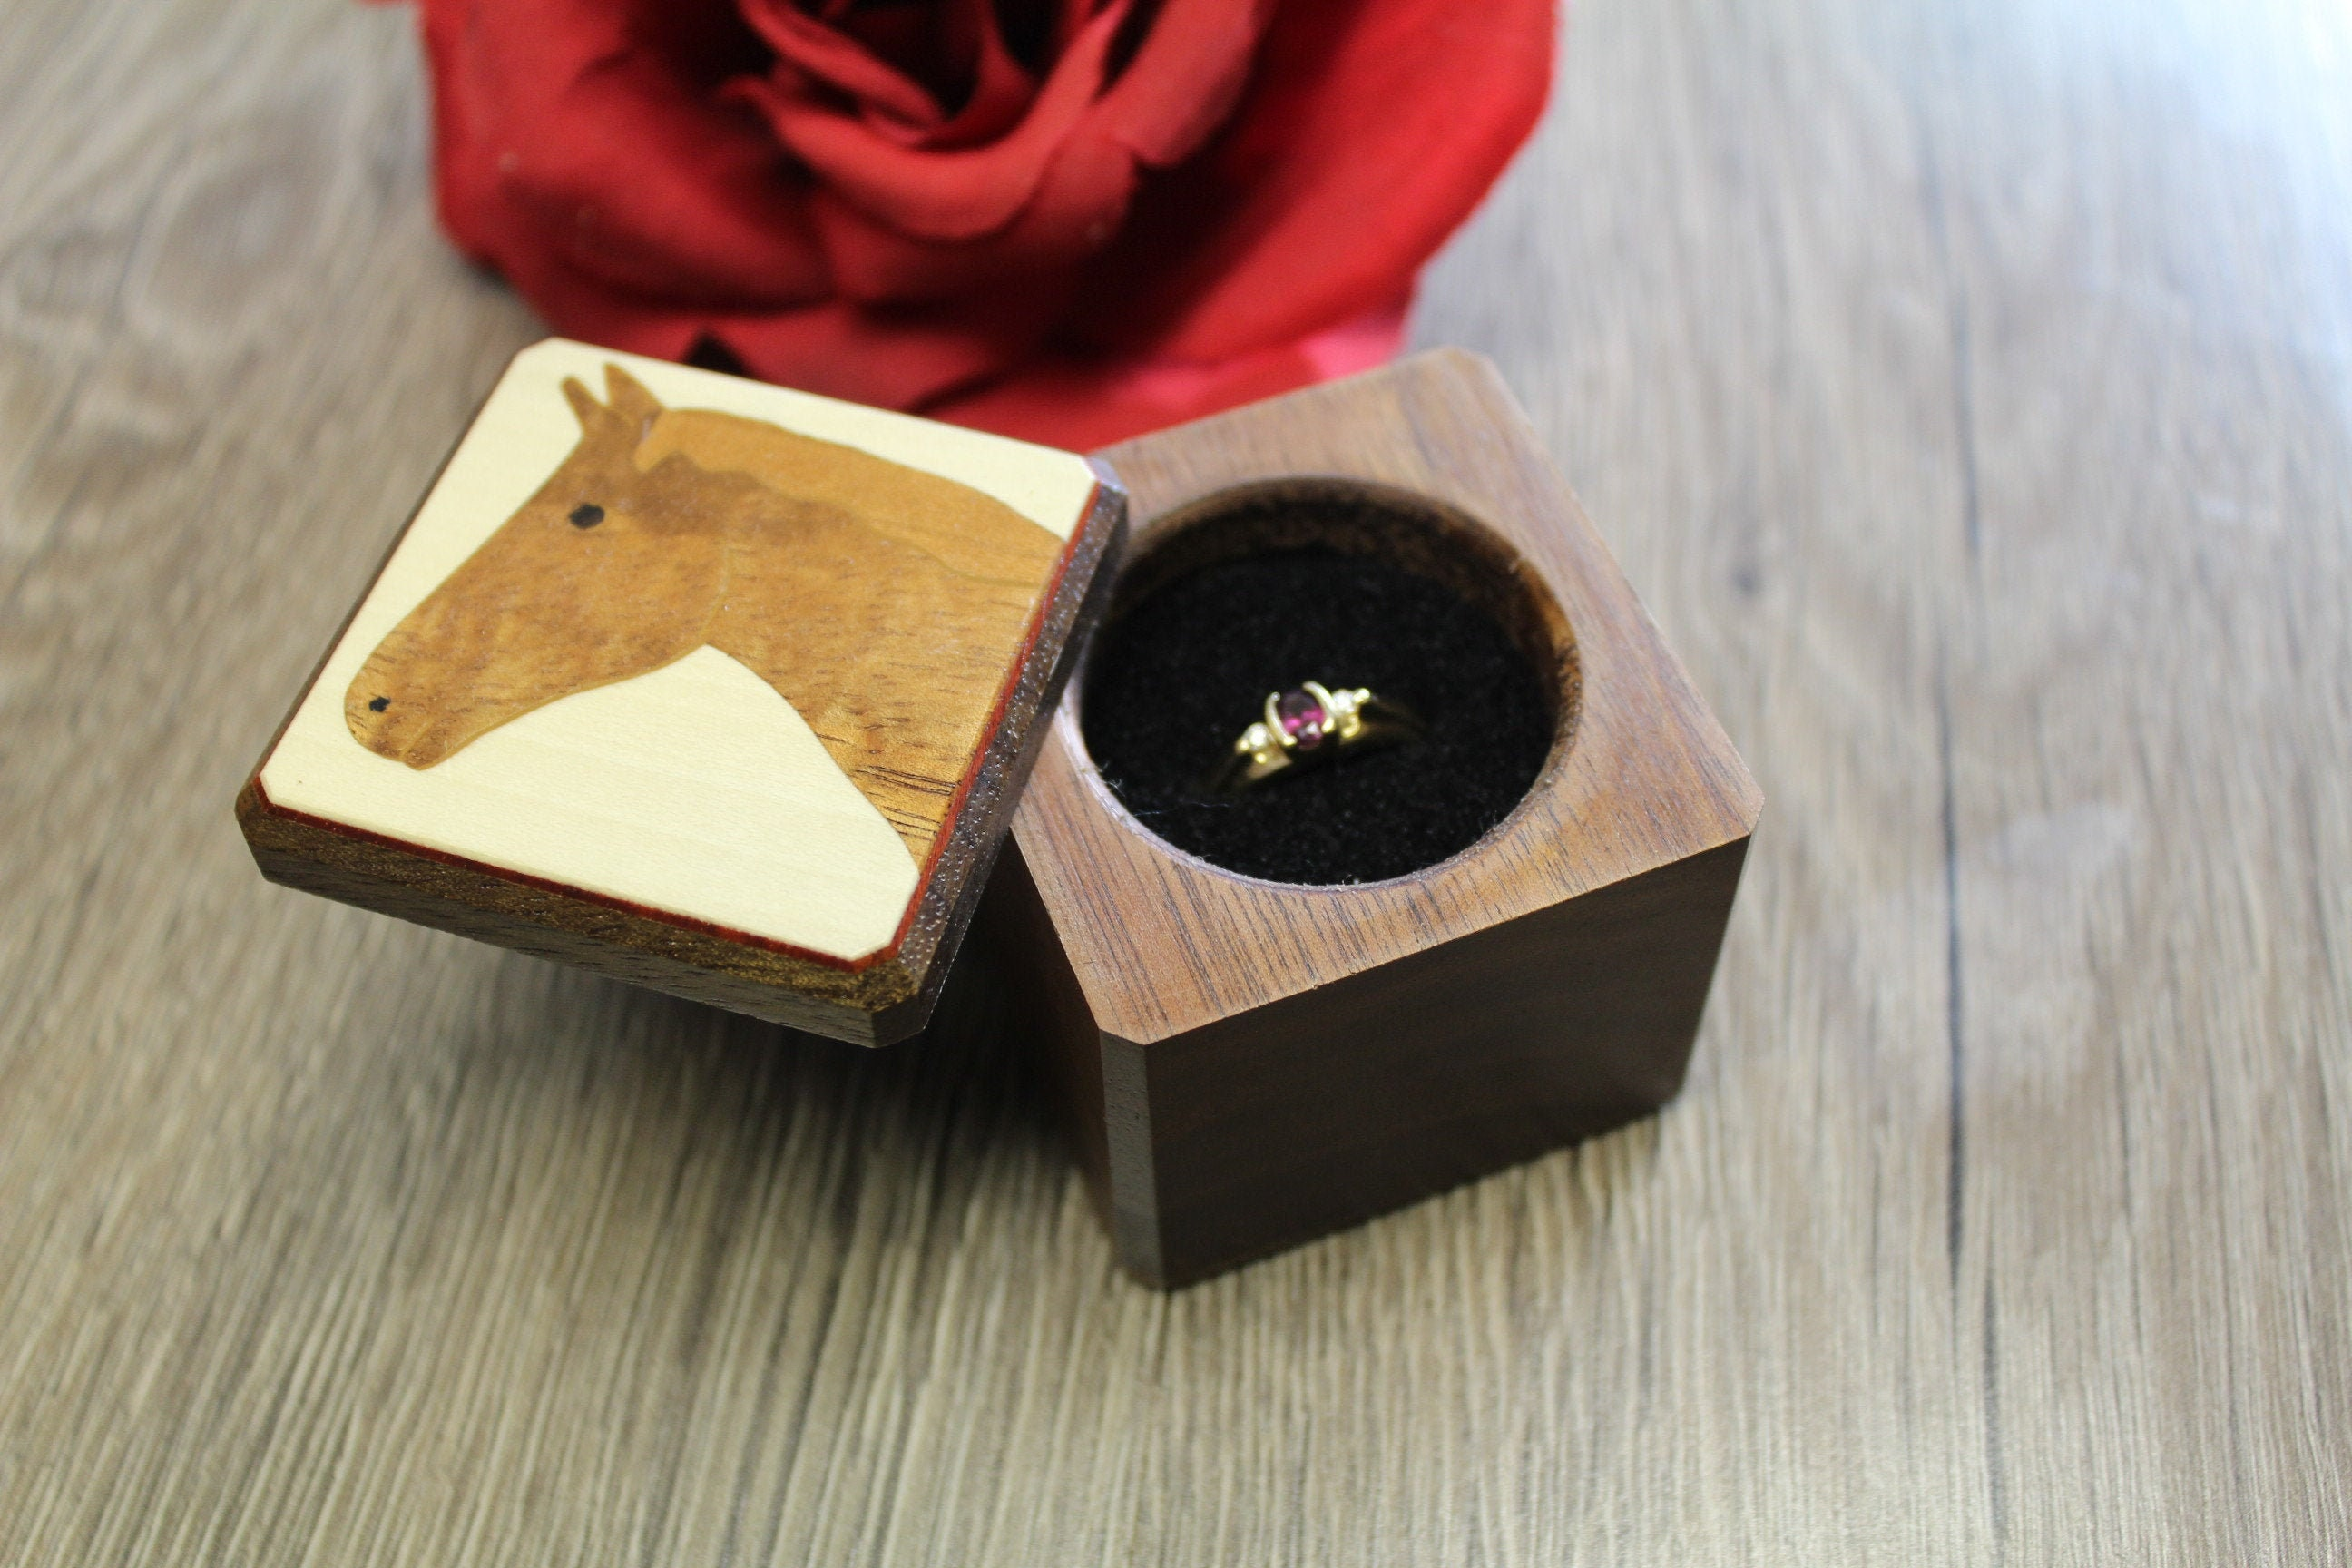 personalized jewelry box gift for women rustic dried flower ring box custom vintage hokder for ring mini birdnest ring bearer